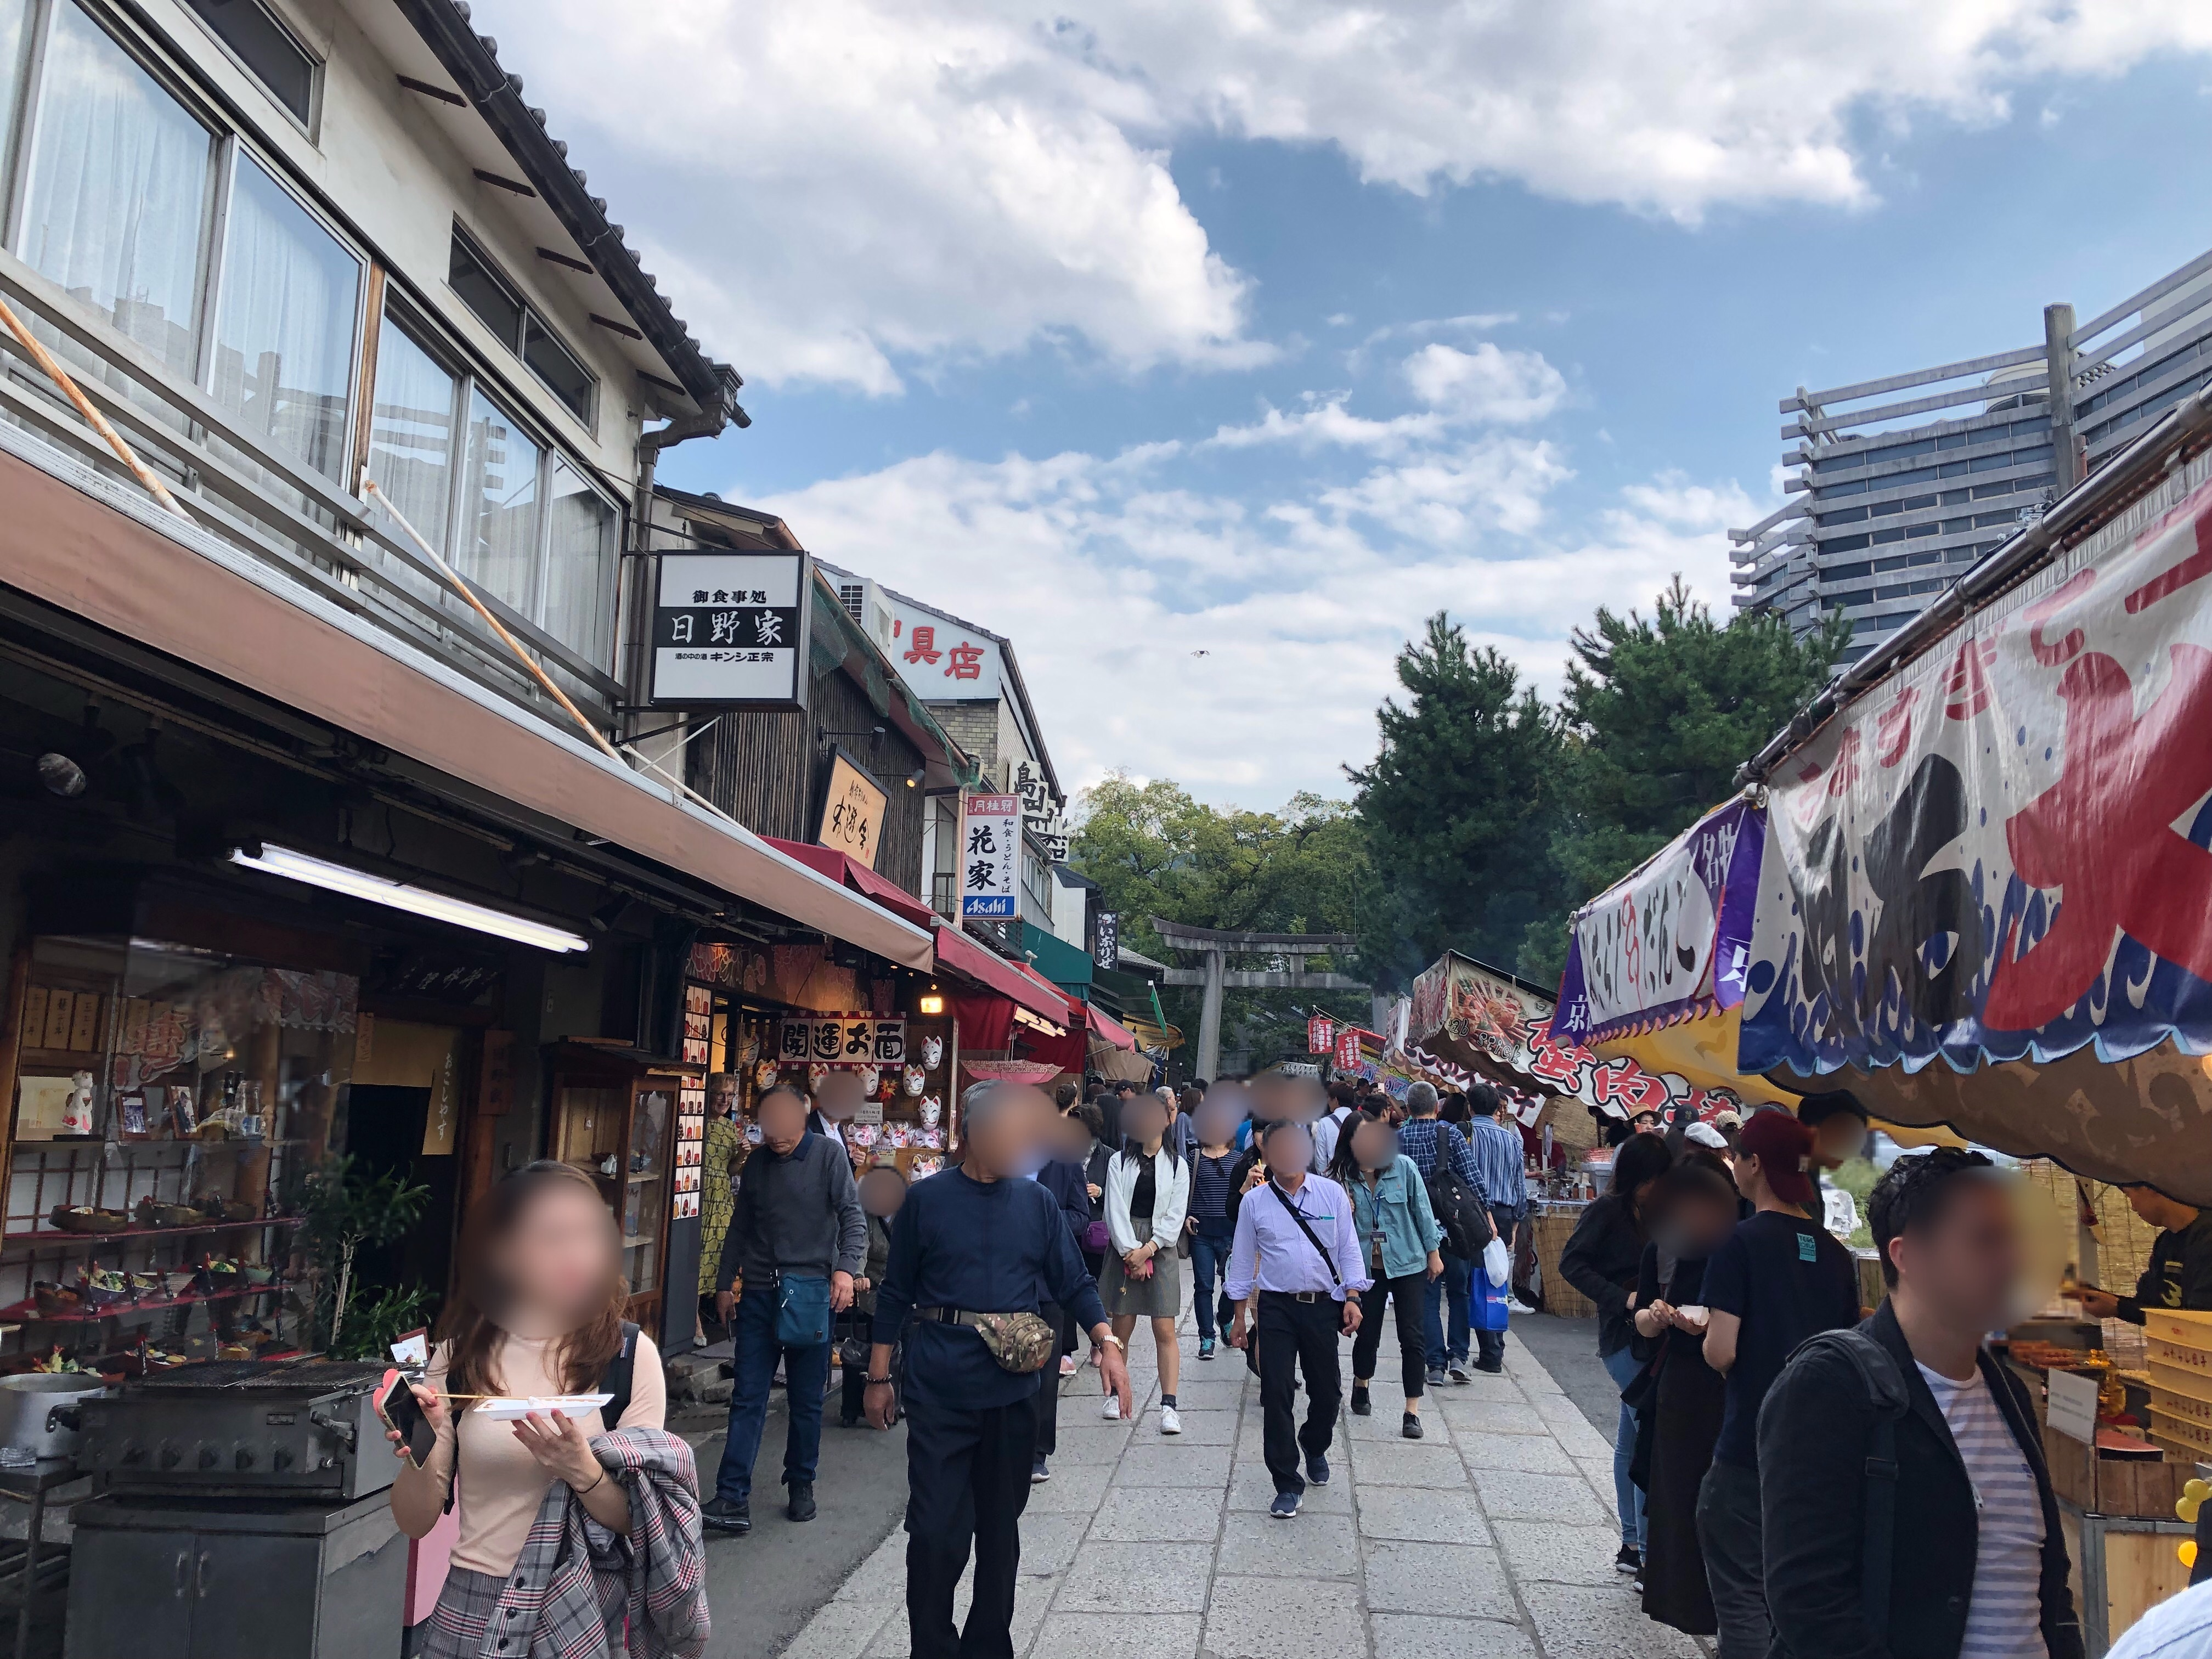 f:id:bakusou009:20181020024102j:plain